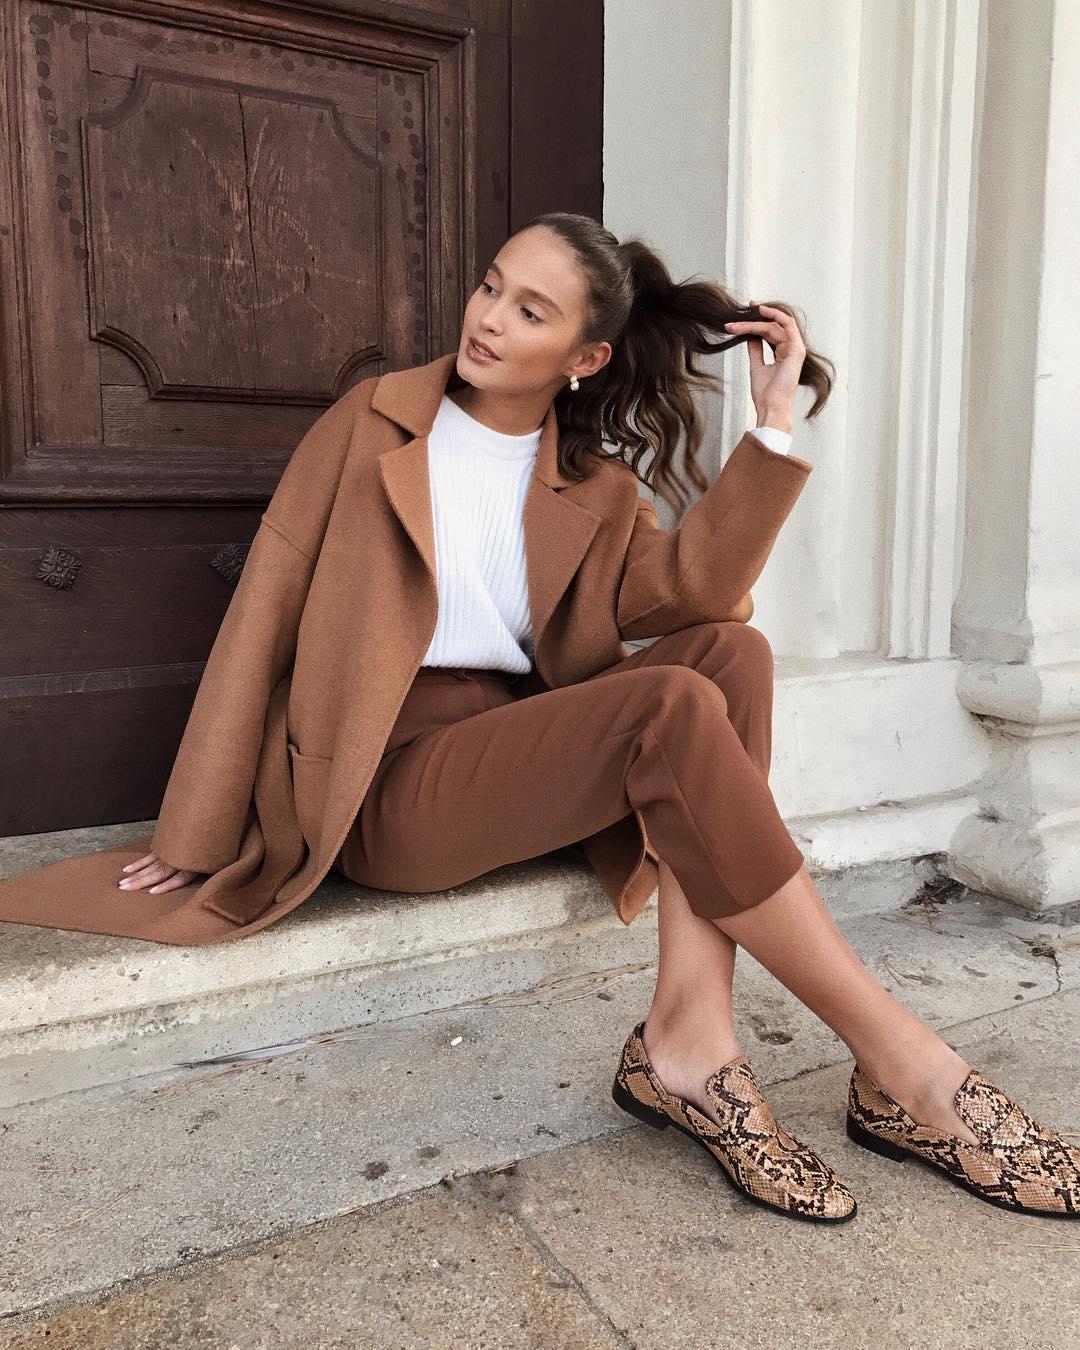 coat with patch pockets de Zara sur majamarko7